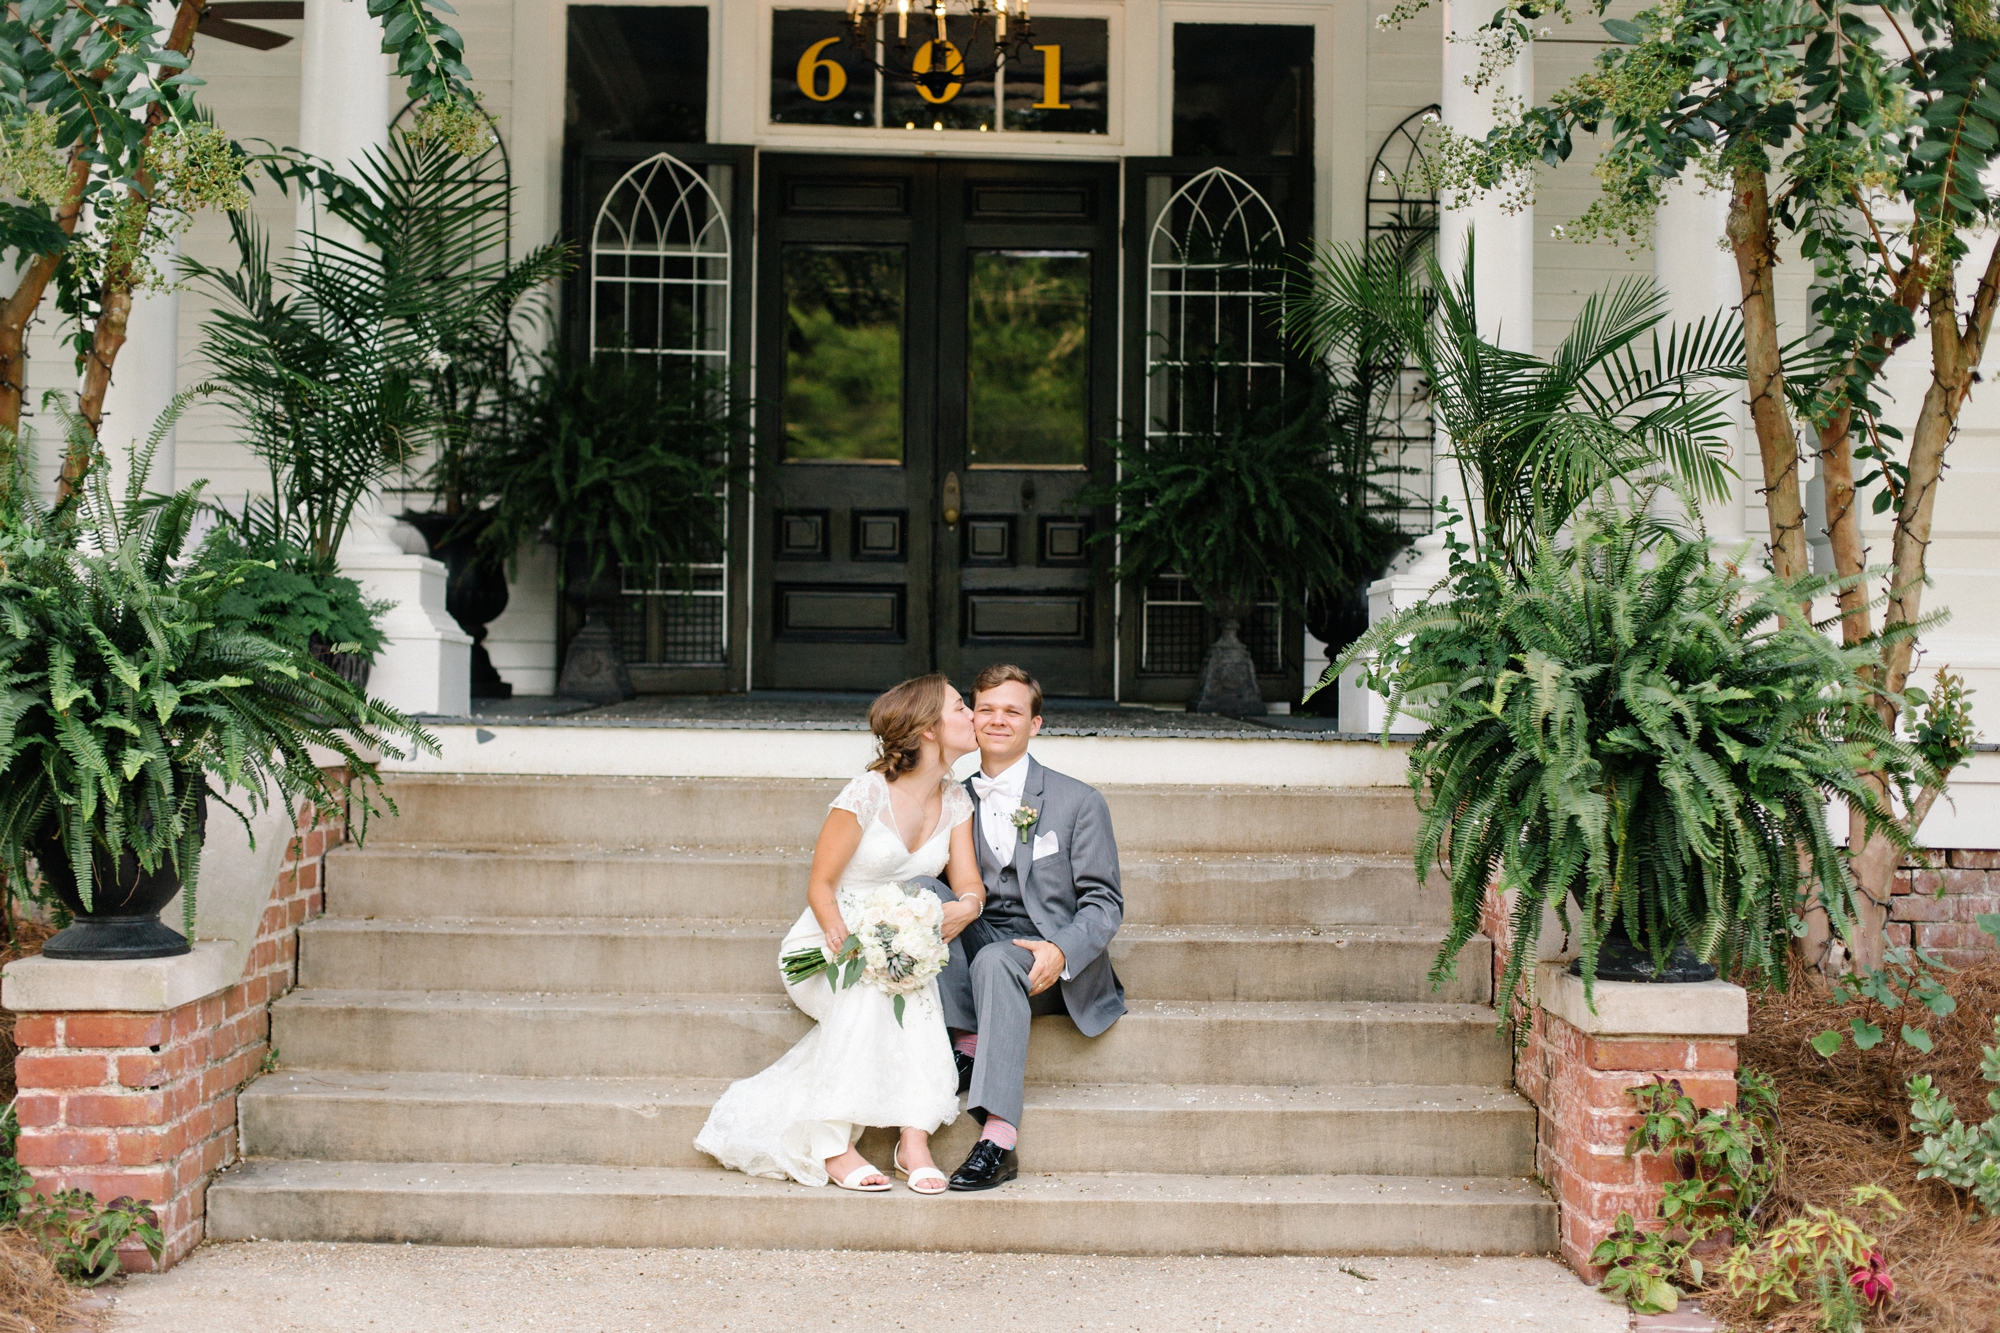 New_Orleans_Wedding_Photographer_1647.jpg